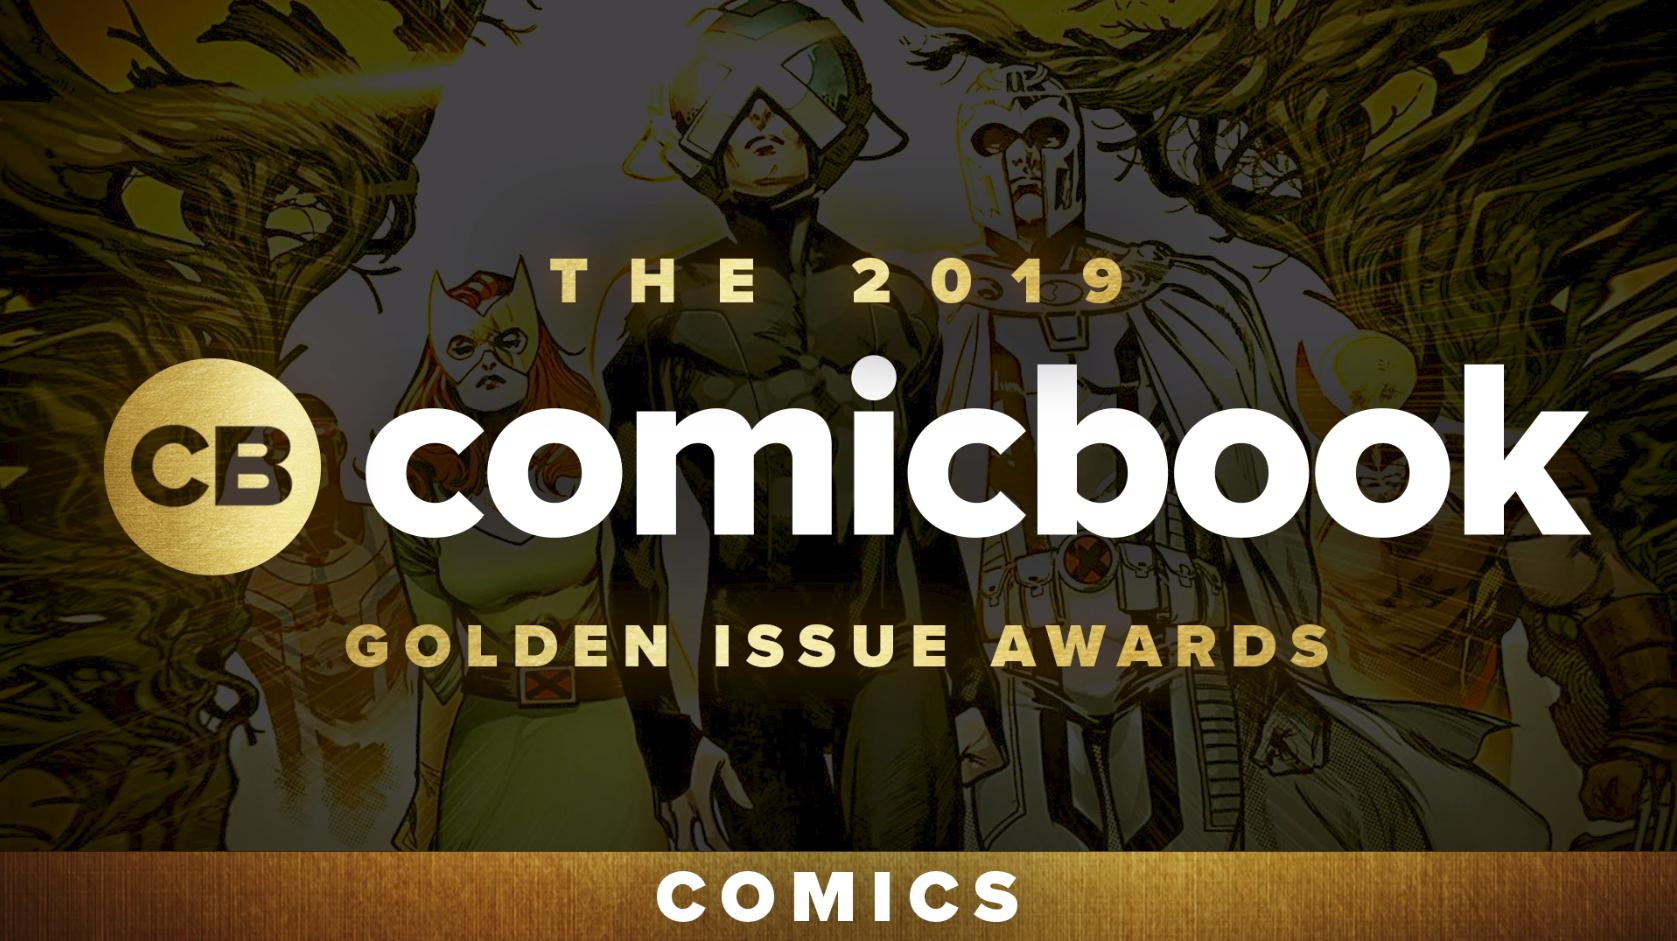 2019 ComicBook Golden Issue Awards - Comics screen capture